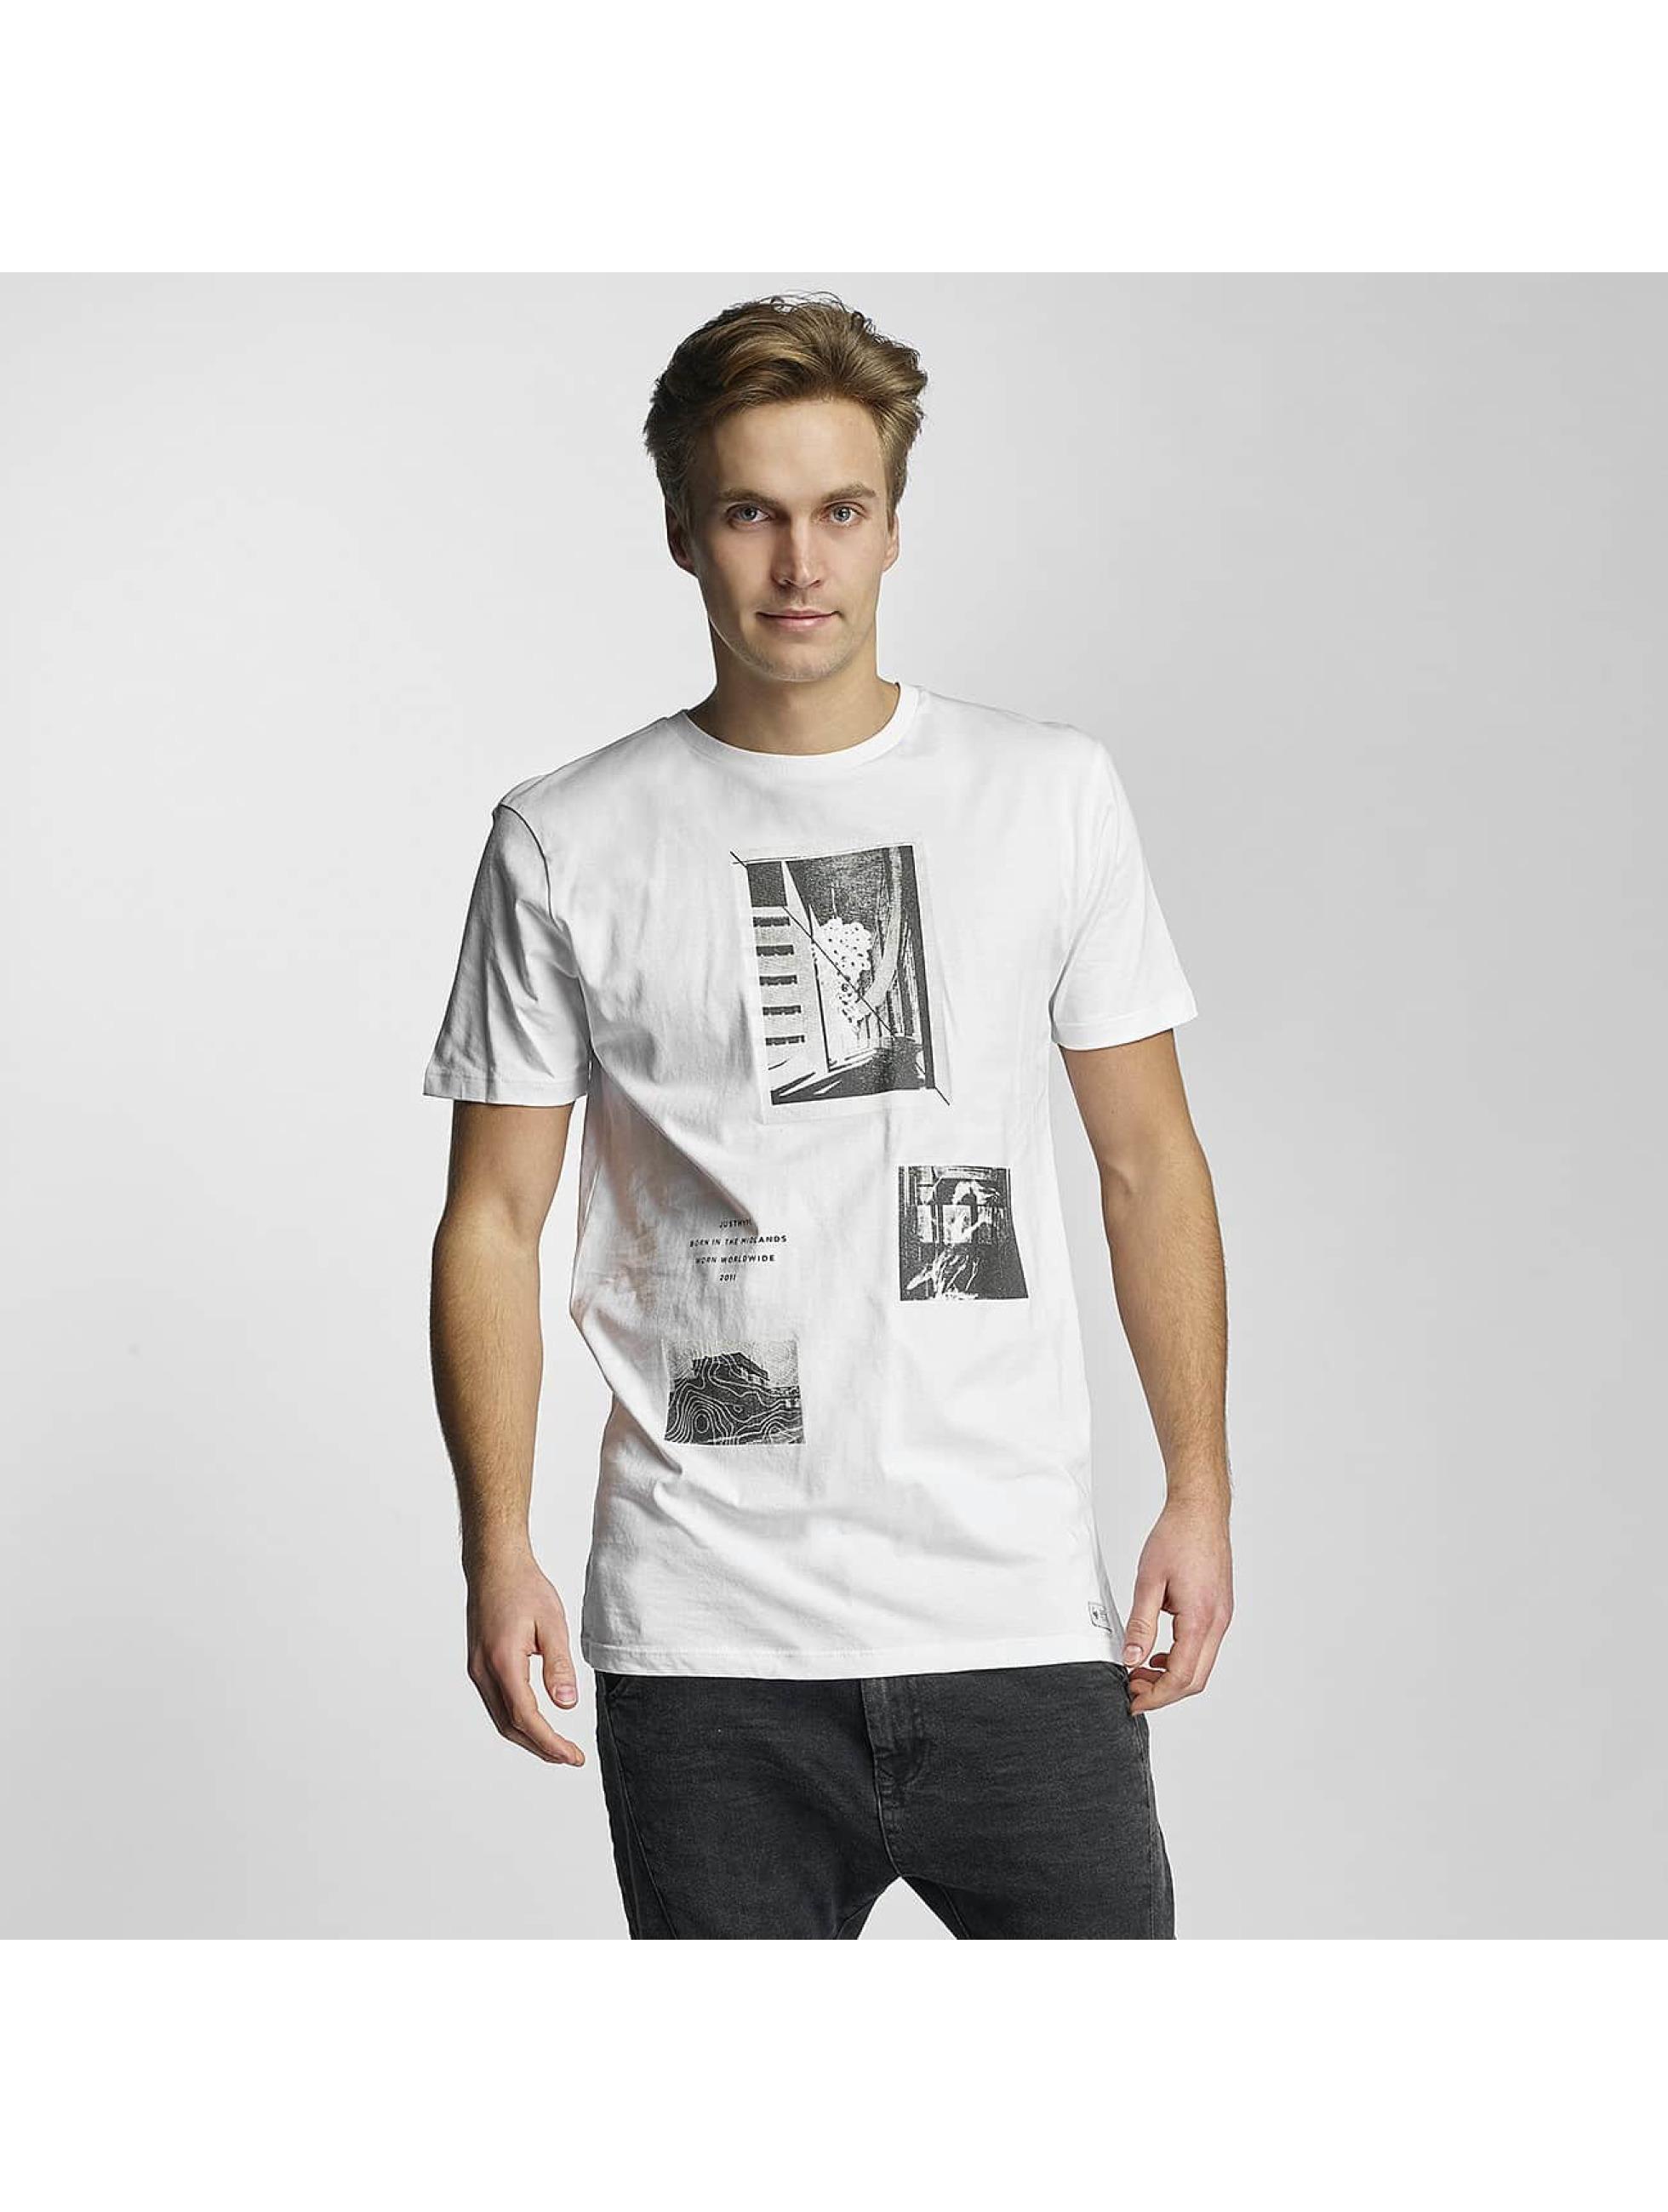 HYPE Männer T-Shirt Haus in weiß